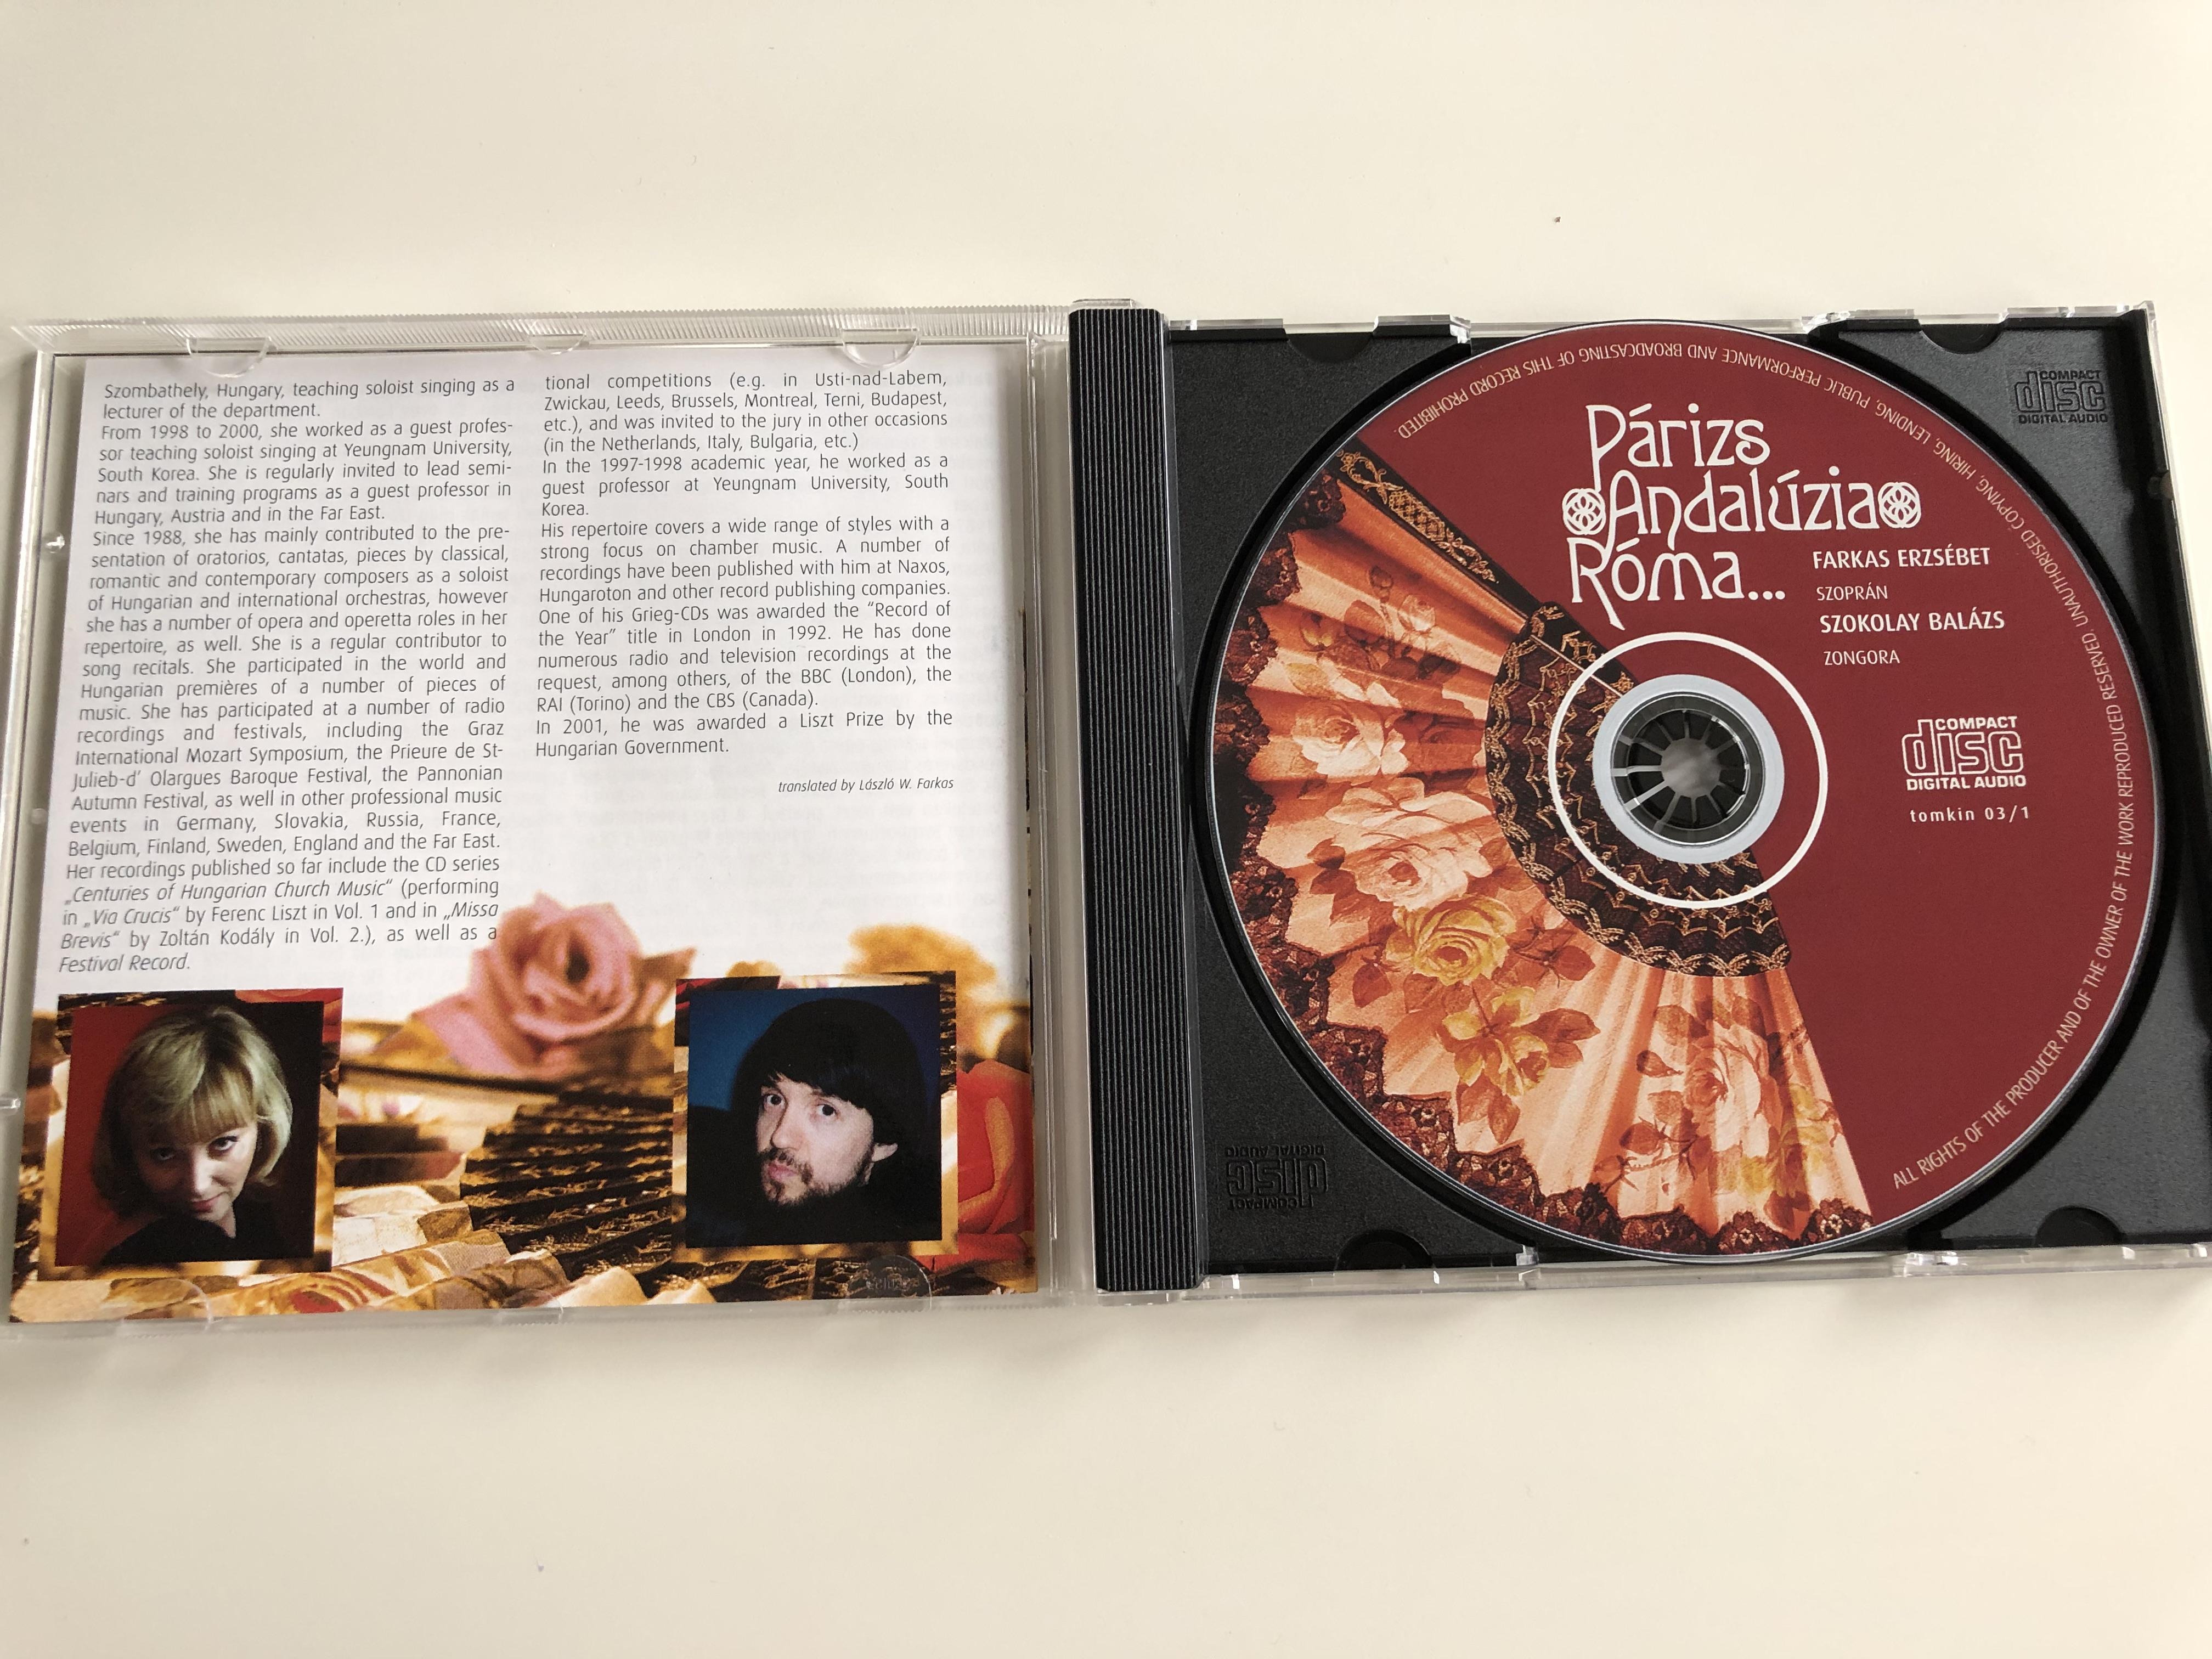 p-rizs-andal-zia-r-ma-farkas-erzs-bet-sopran-szokolay-bal-zs-piano-audio-cd-tomkin-031-7-.jpg